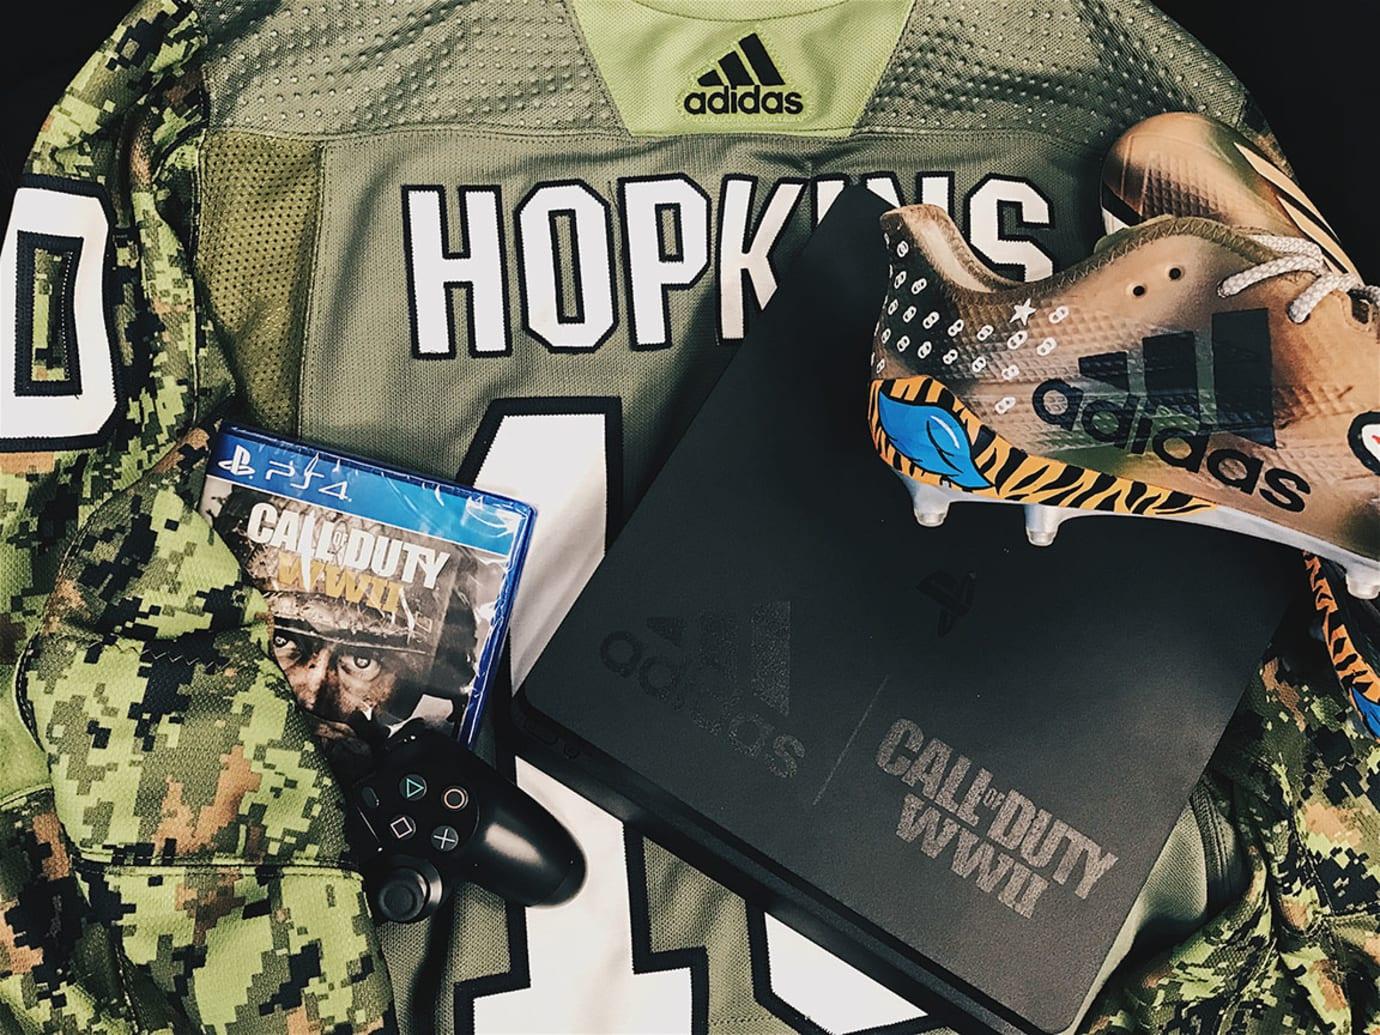 Adidas Call of Duty Cleats DeAndre Hopkins